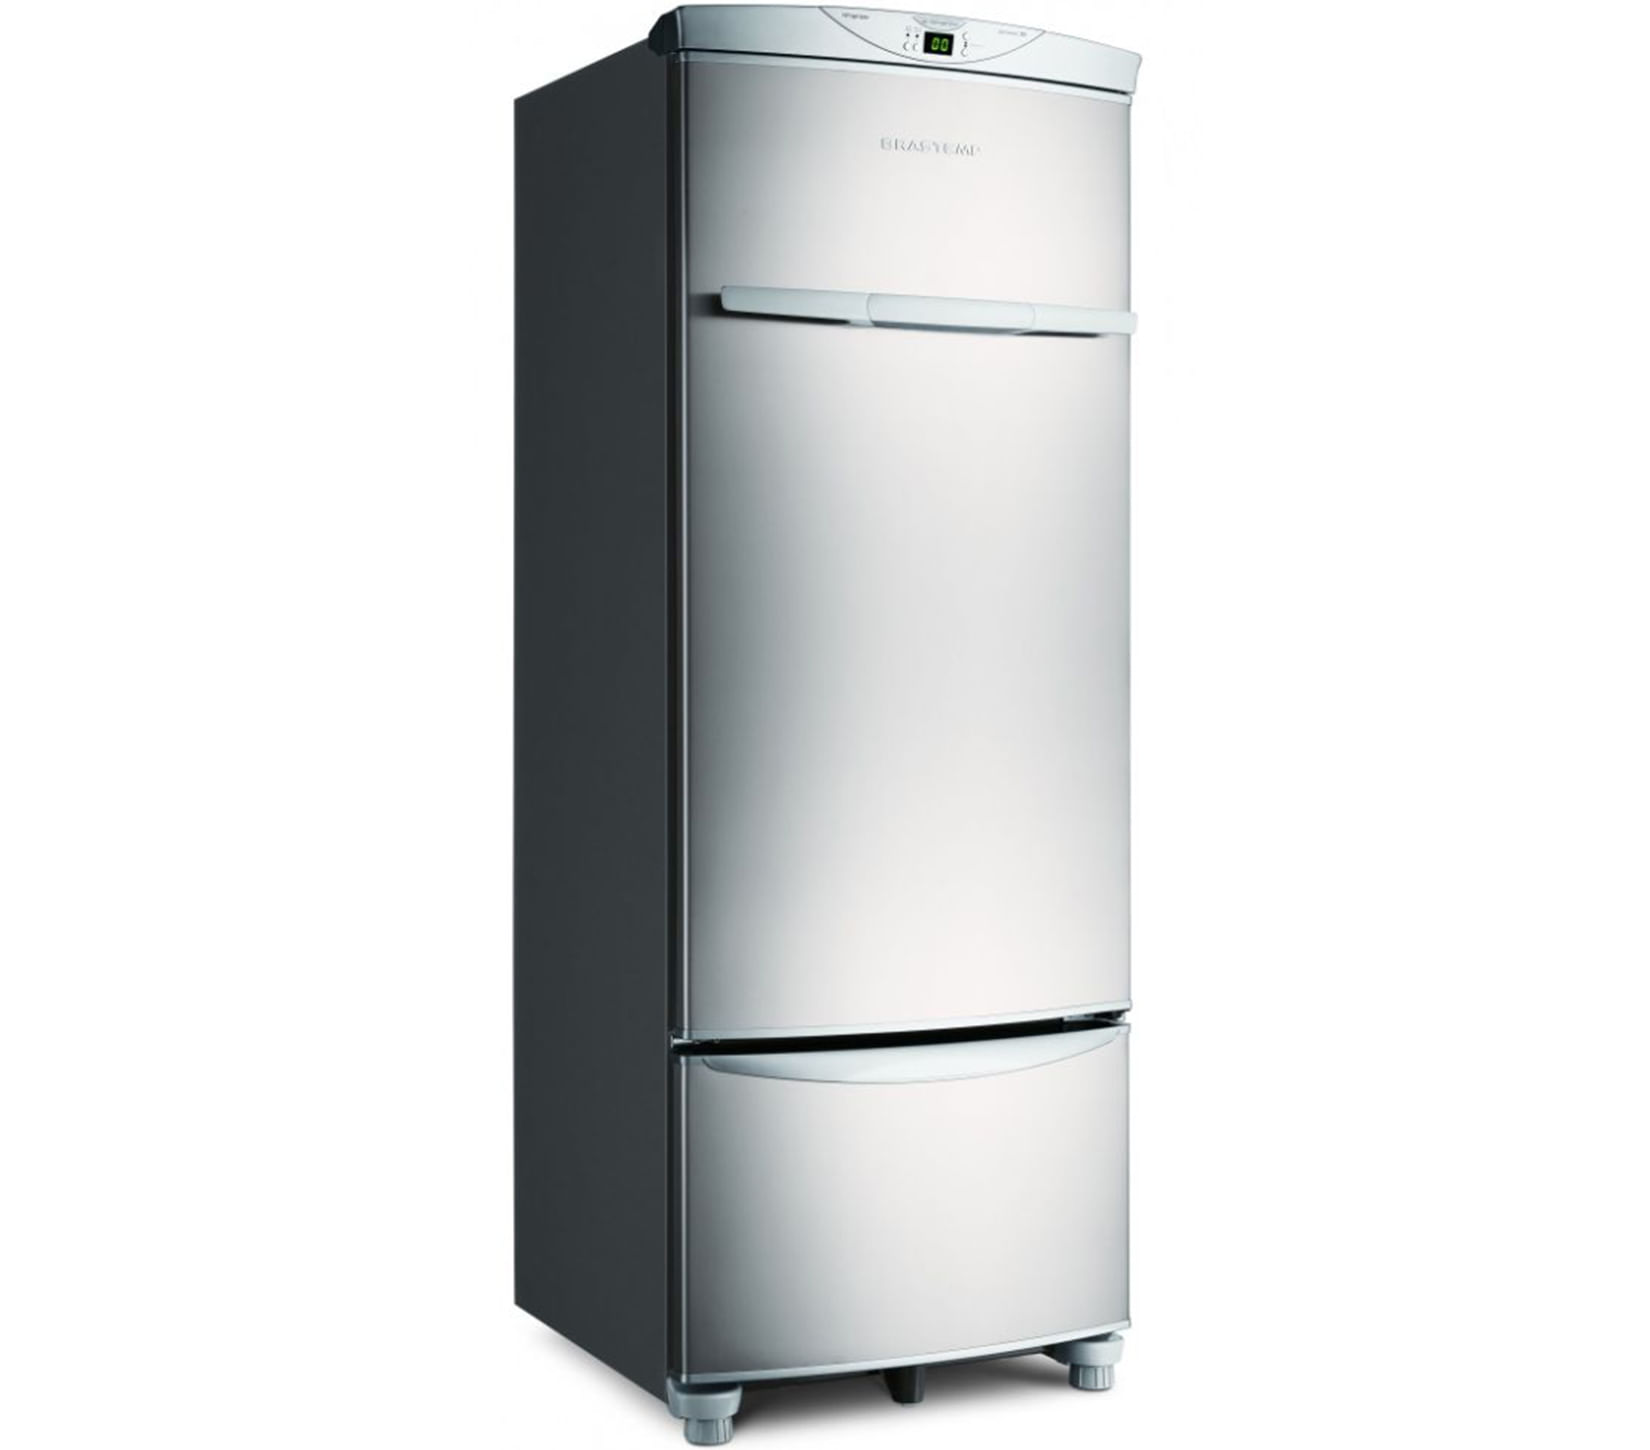 Geladeira Brastemp Clean All Refrigerator 330 Litros